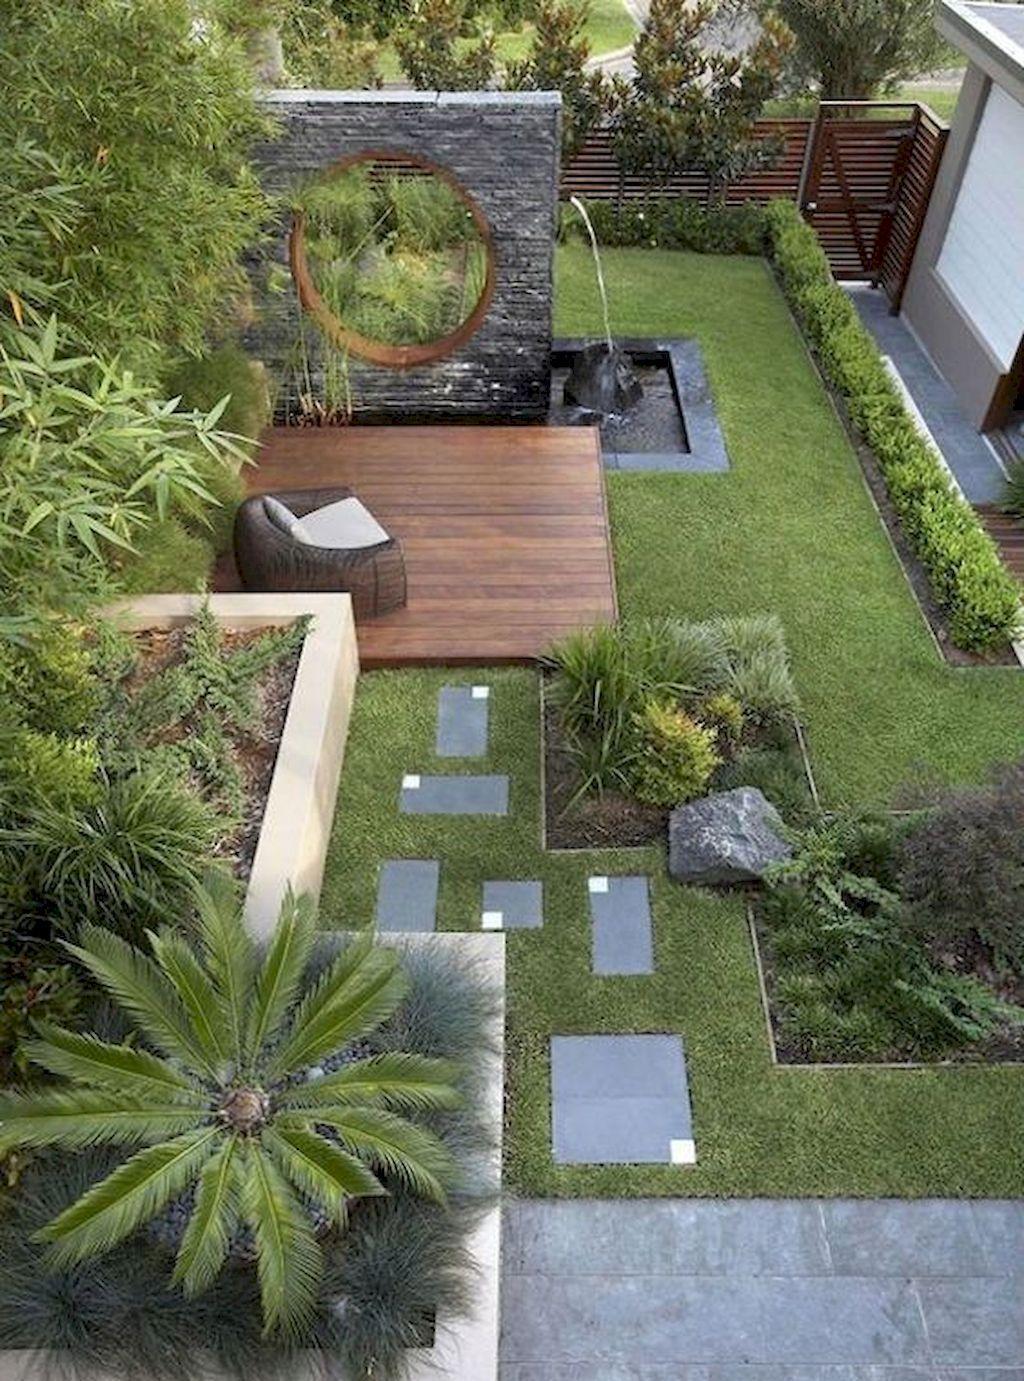 Superb Amazing Ways Design Landscape Garden In 2020 Easy Backyard Landscaping Small Backyard Gardens Small Backyard Landscaping